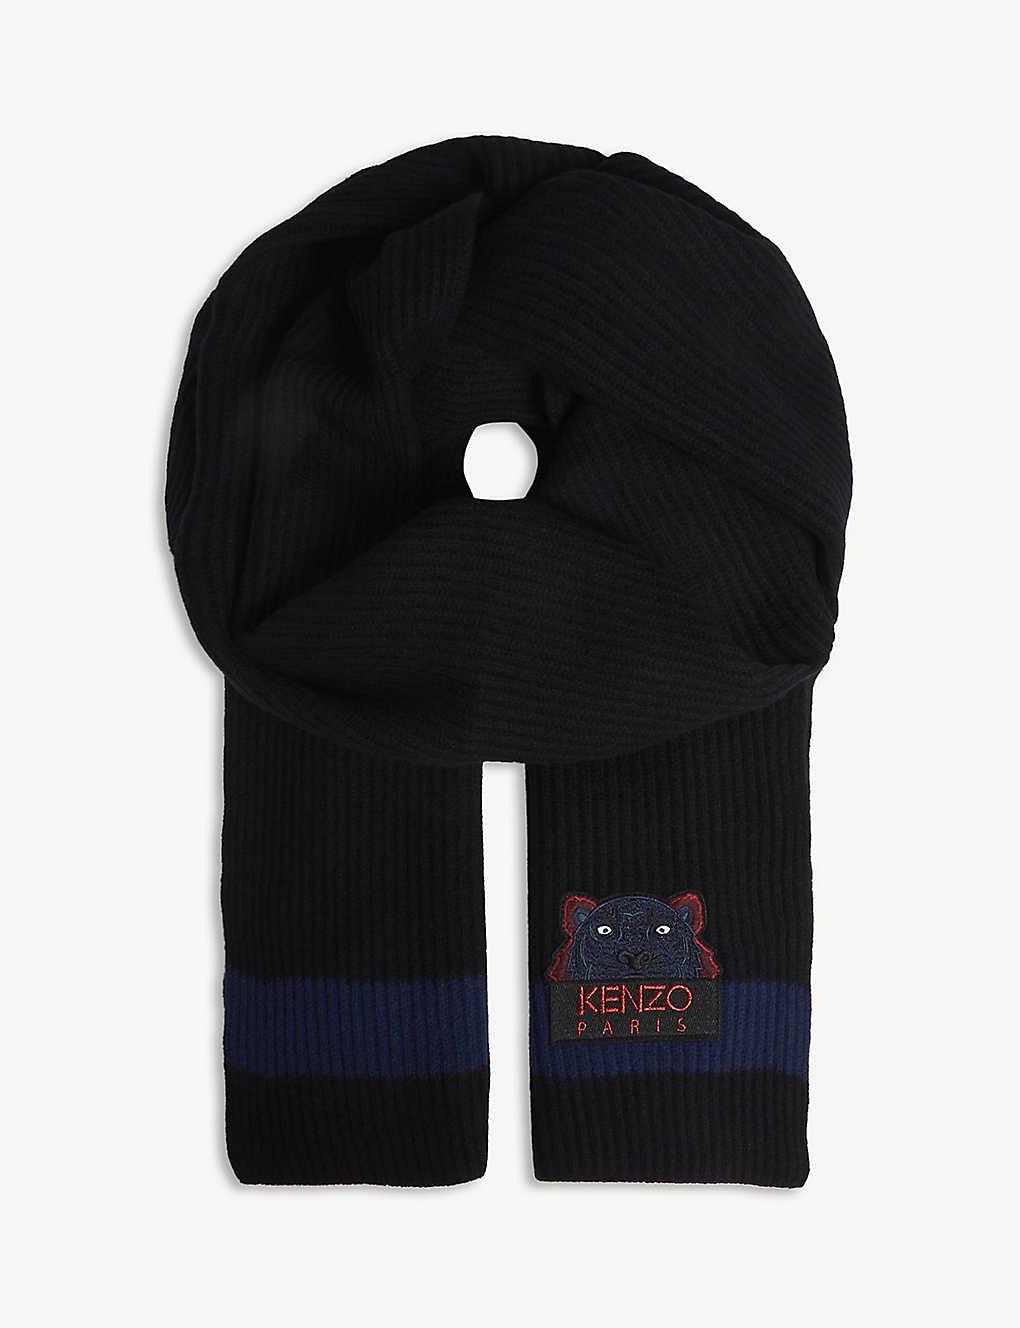 KENZO - Wool knit scarf   Selfridges.com 5fc61186c23